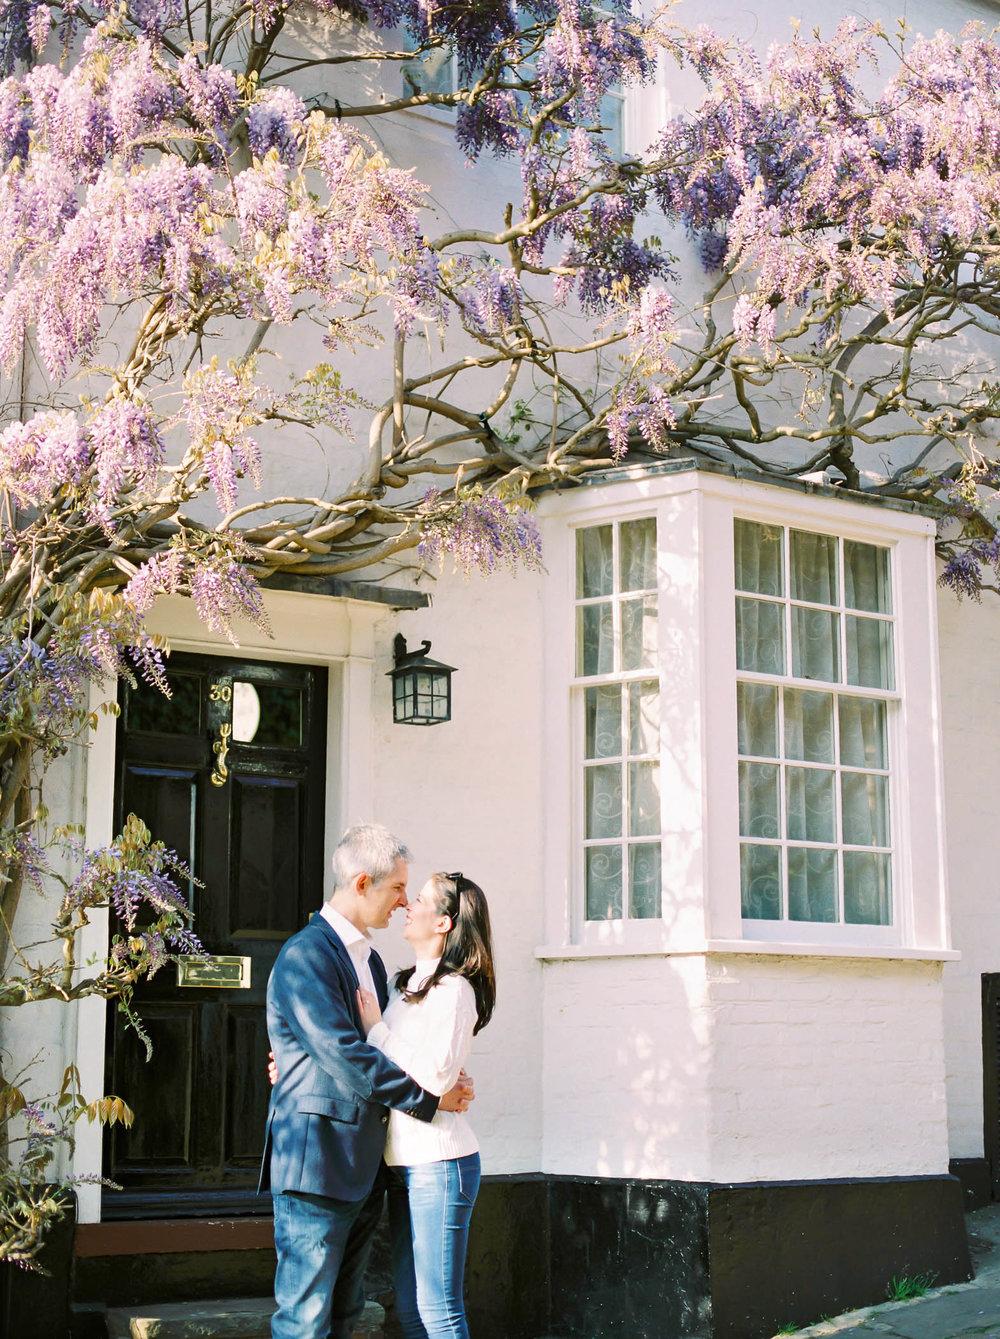 Amy O'Boyle Photography- Destination & UK Fine Art Film Wedding Photographer- Rye Engagement Shoot-1.jpg